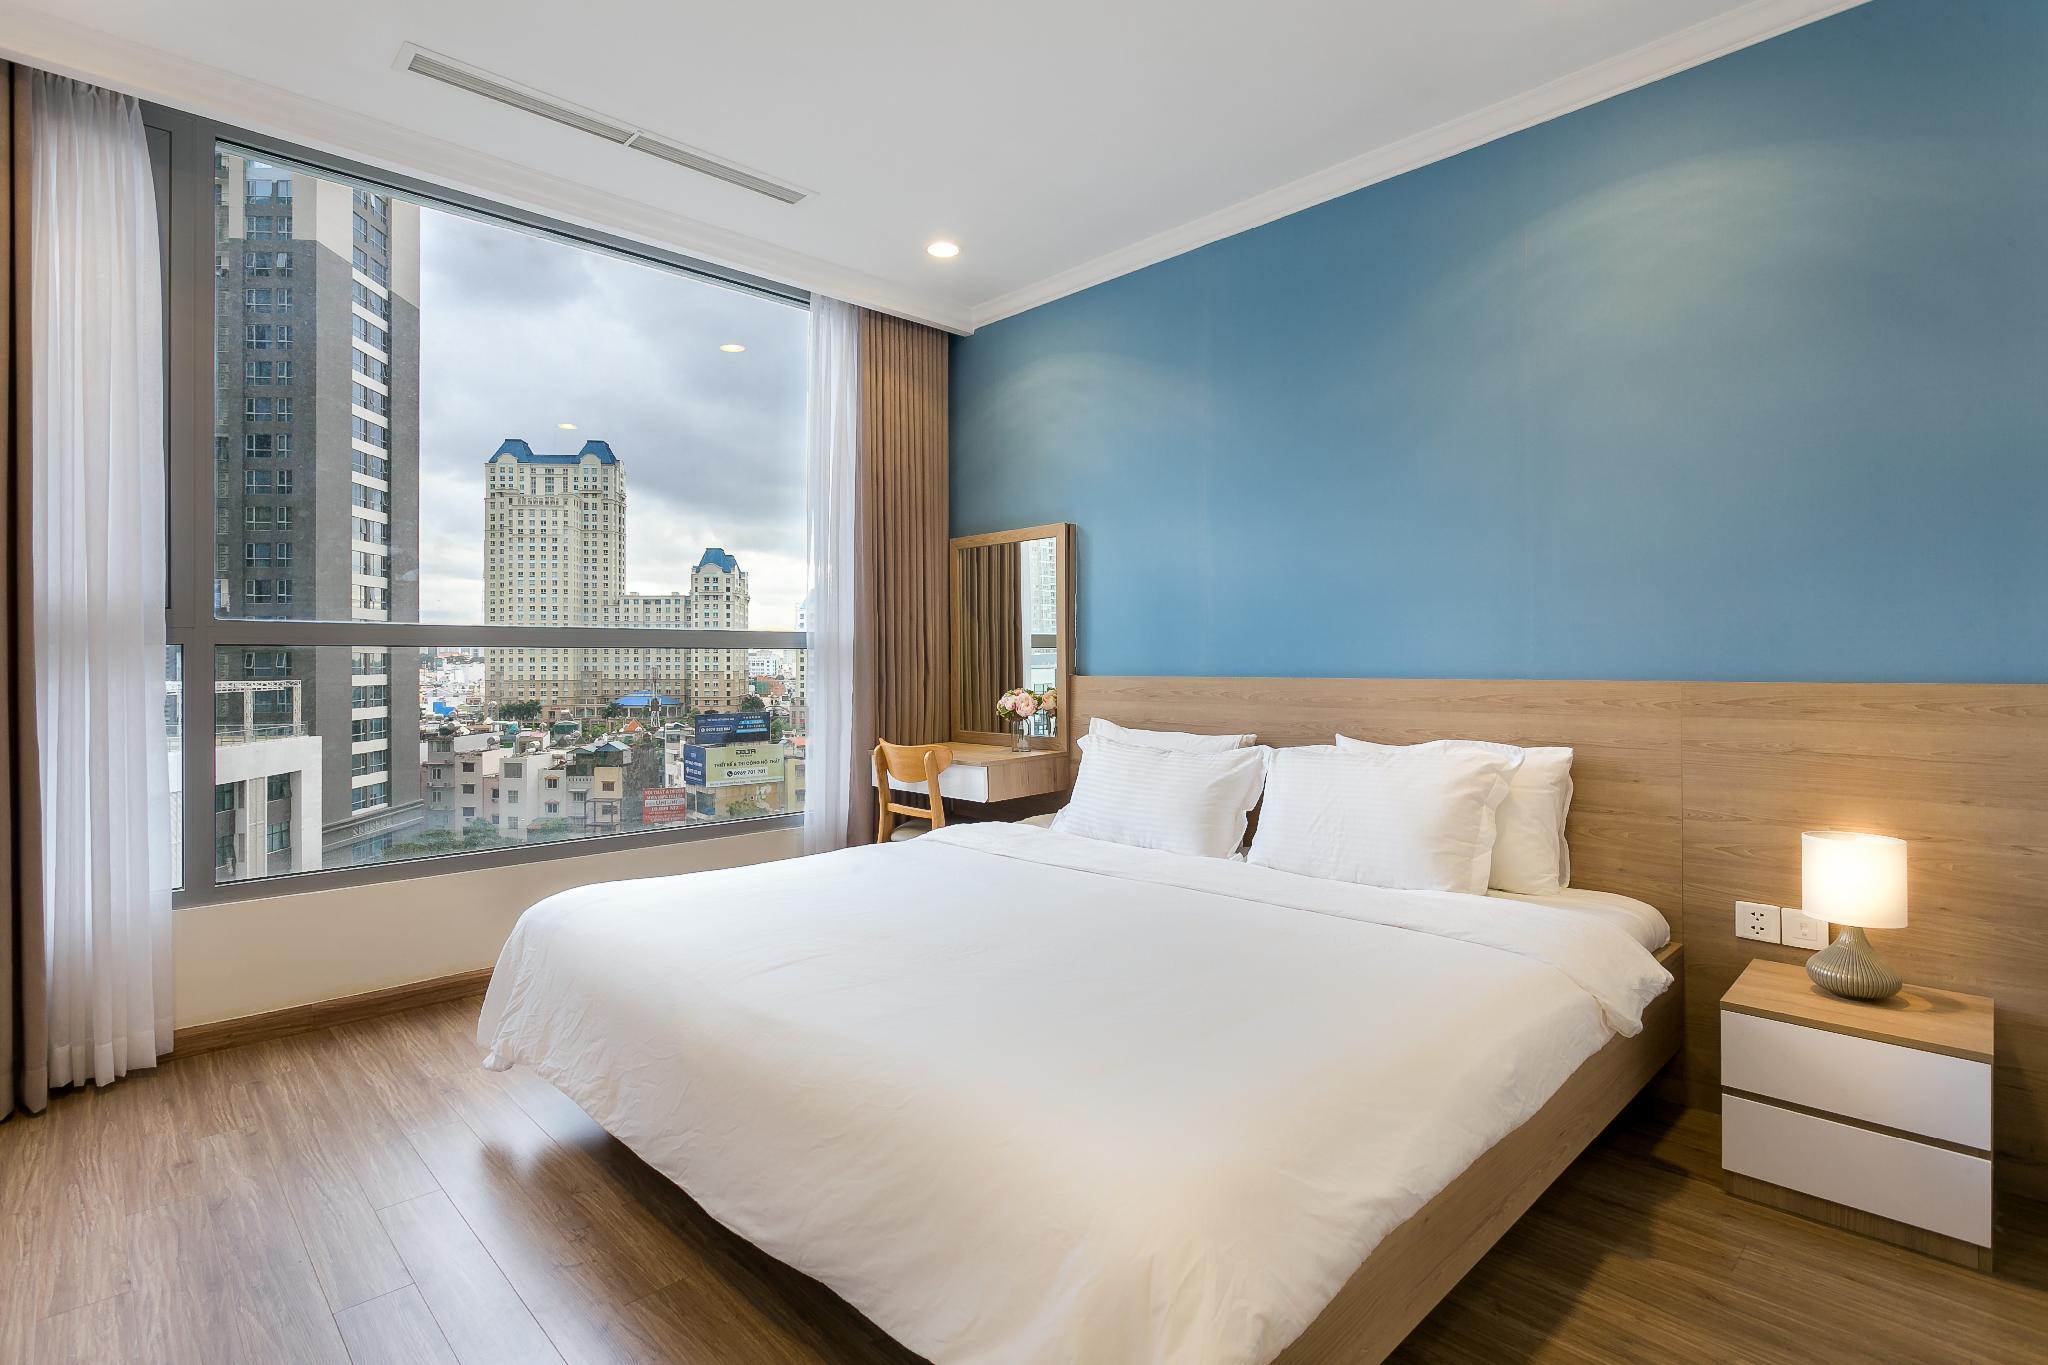 Luxury 3 Bedroom Apartments Vinhomes